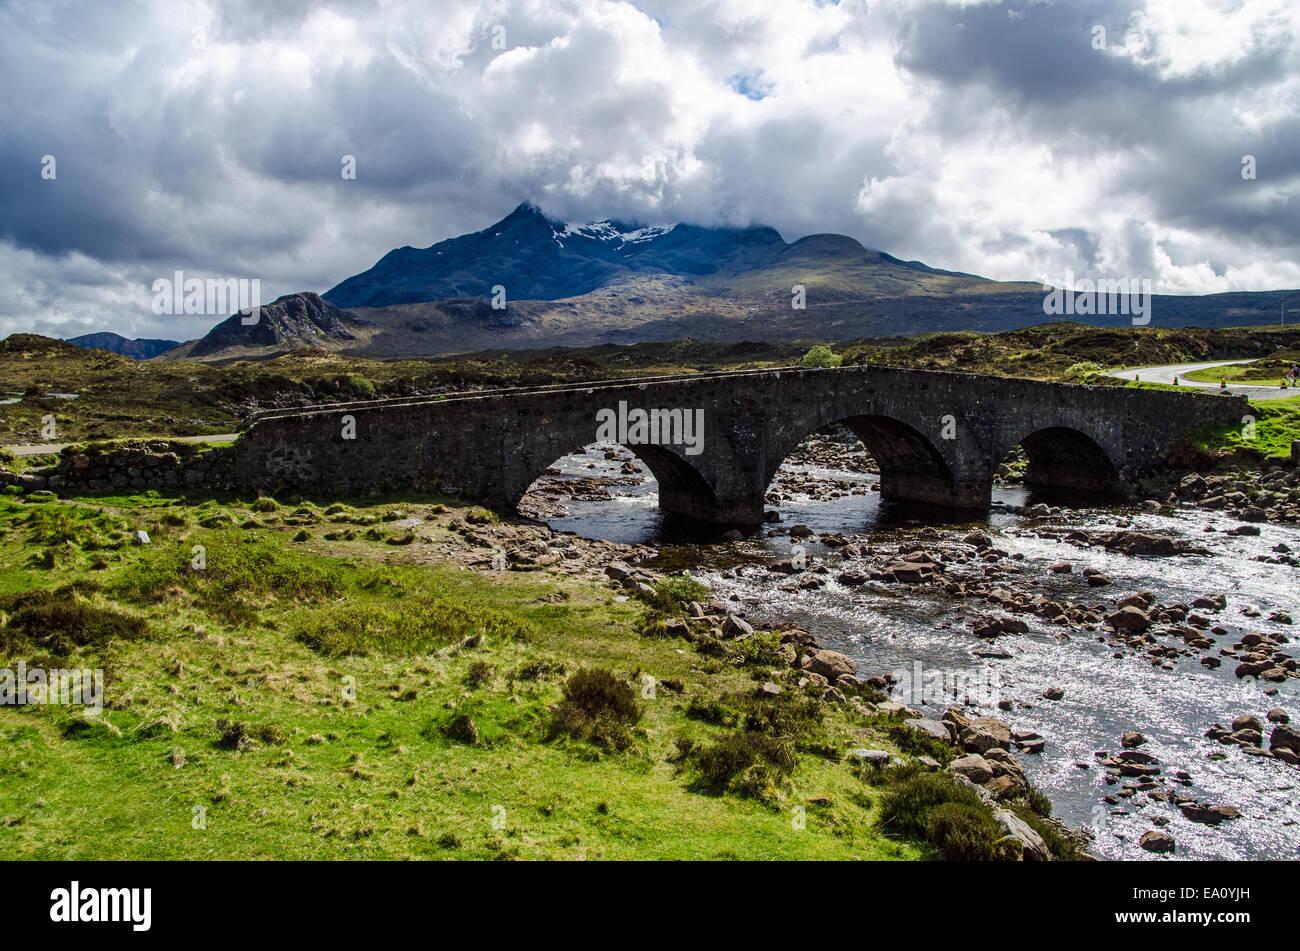 Sligachan,Black Cuillin Mountains on the Isle of Skye - Stock Image